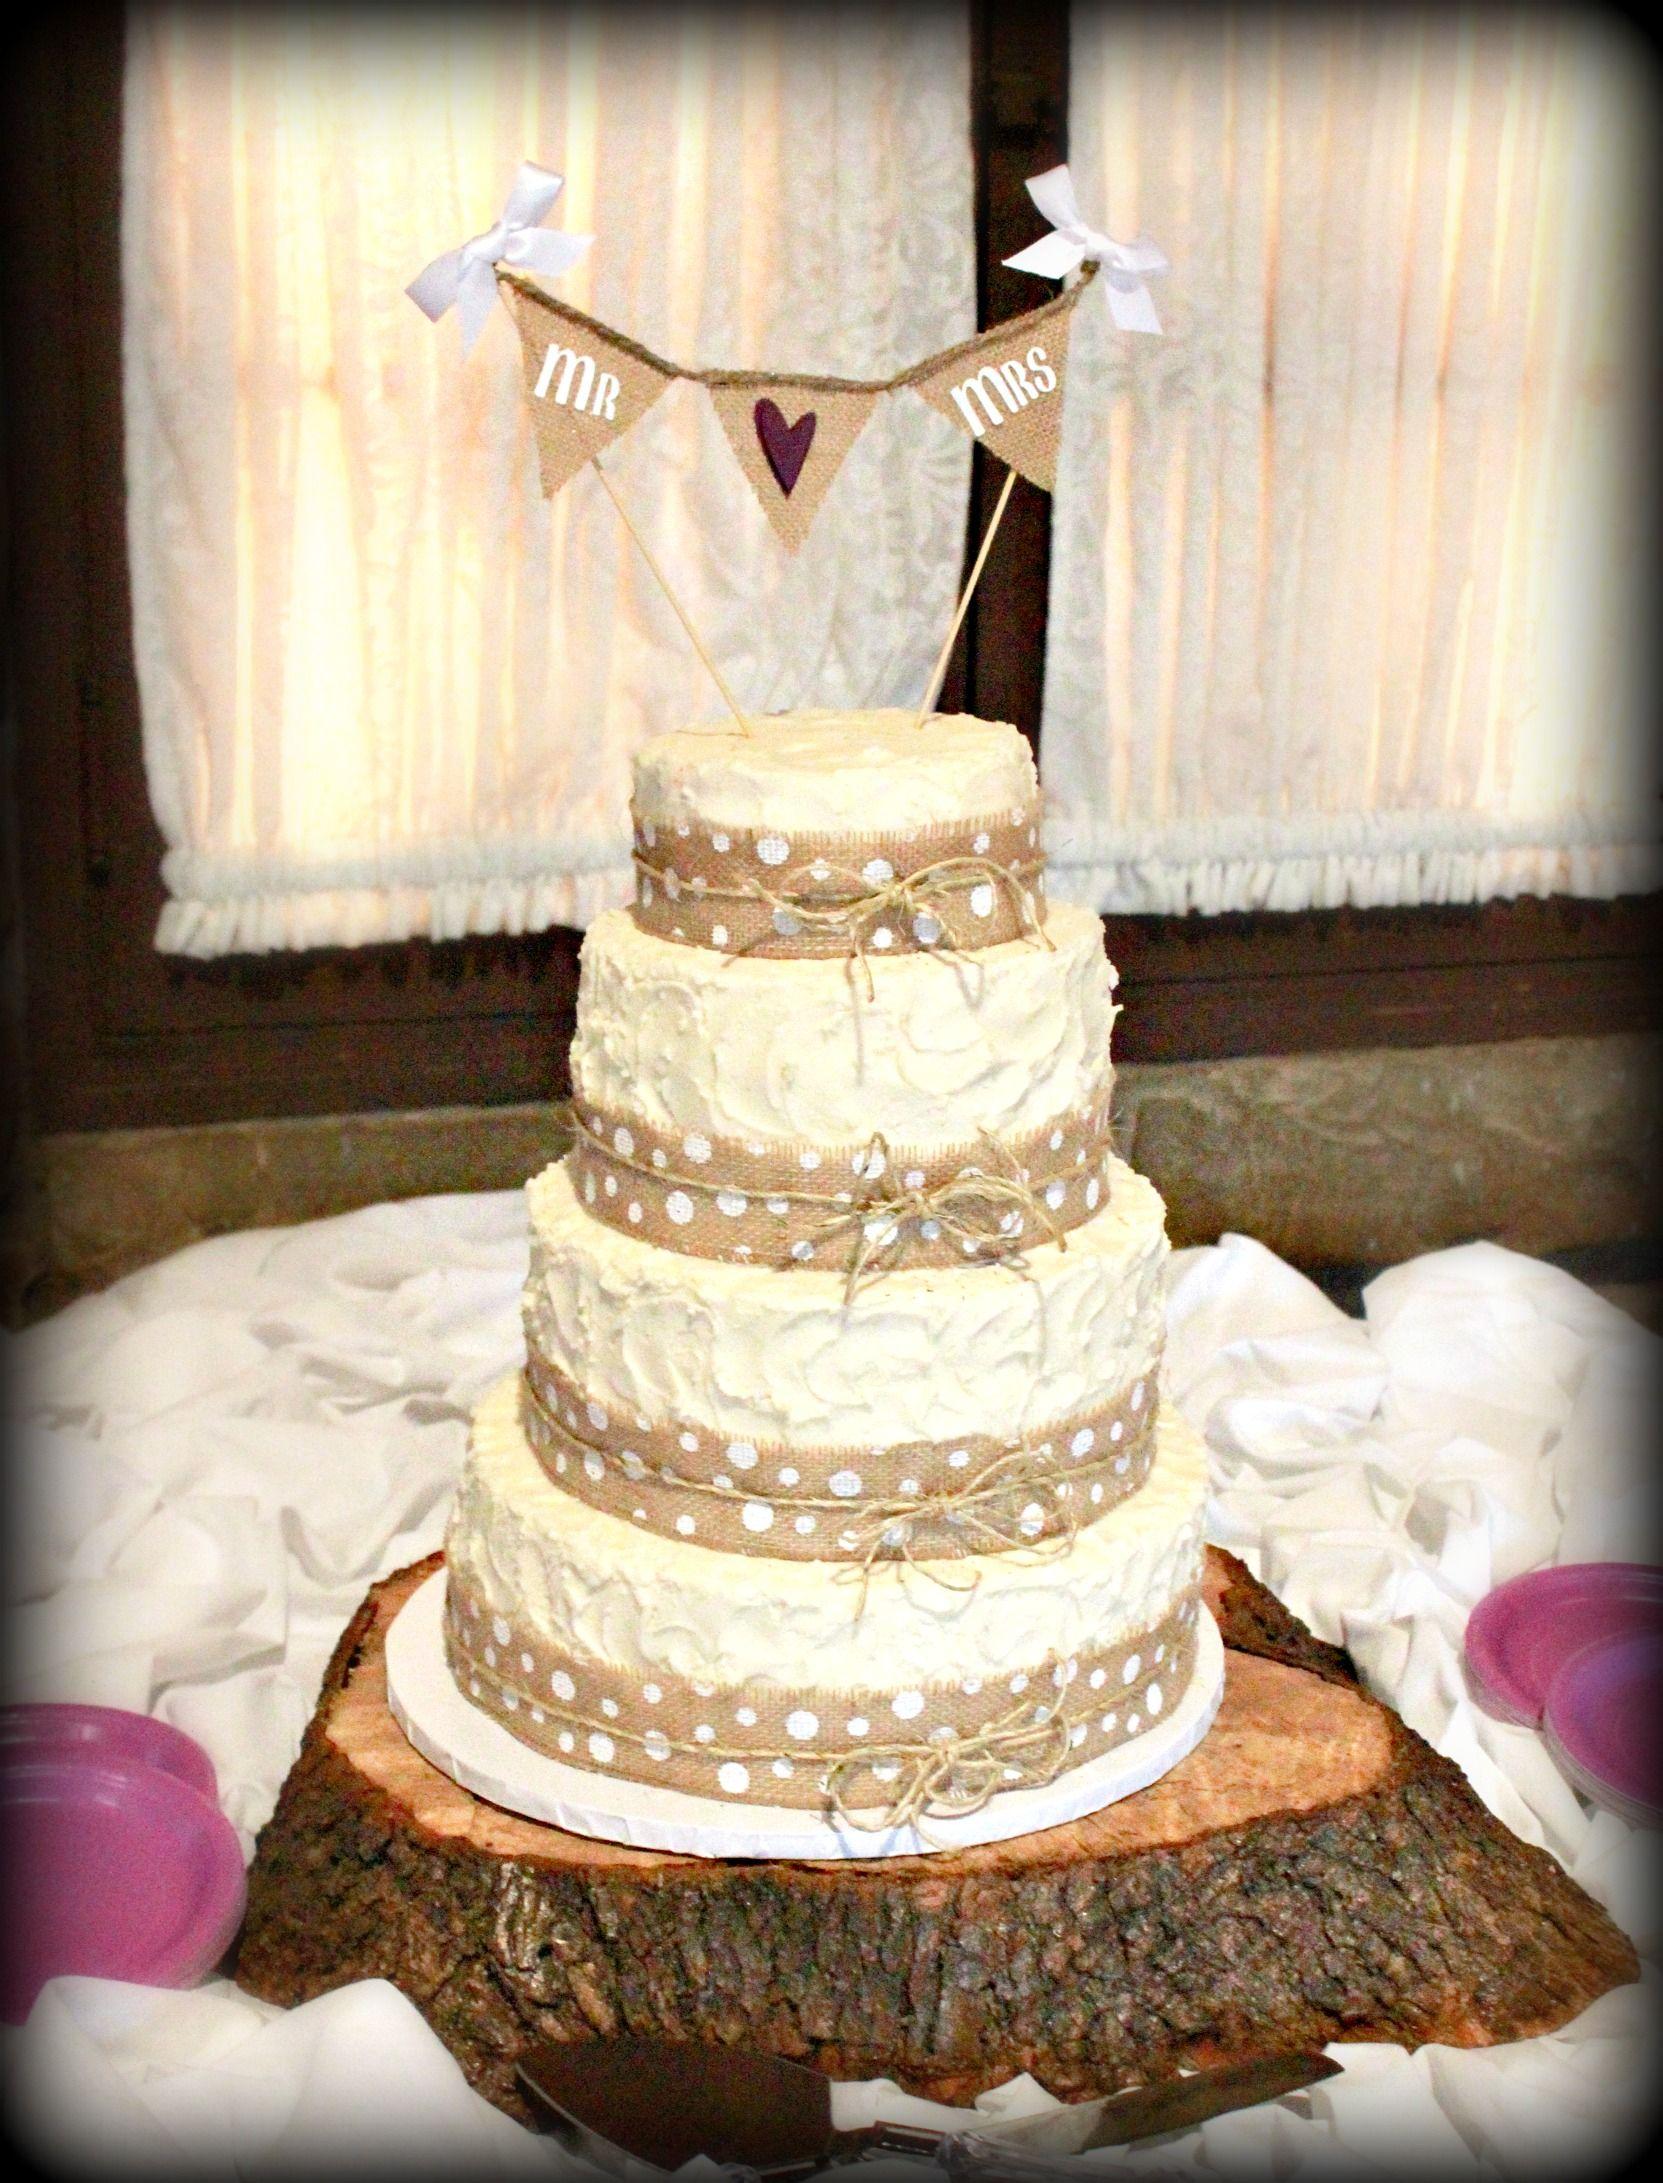 Adorable Wedding Cake with polka dots & burlap. #rustic wedding at ...